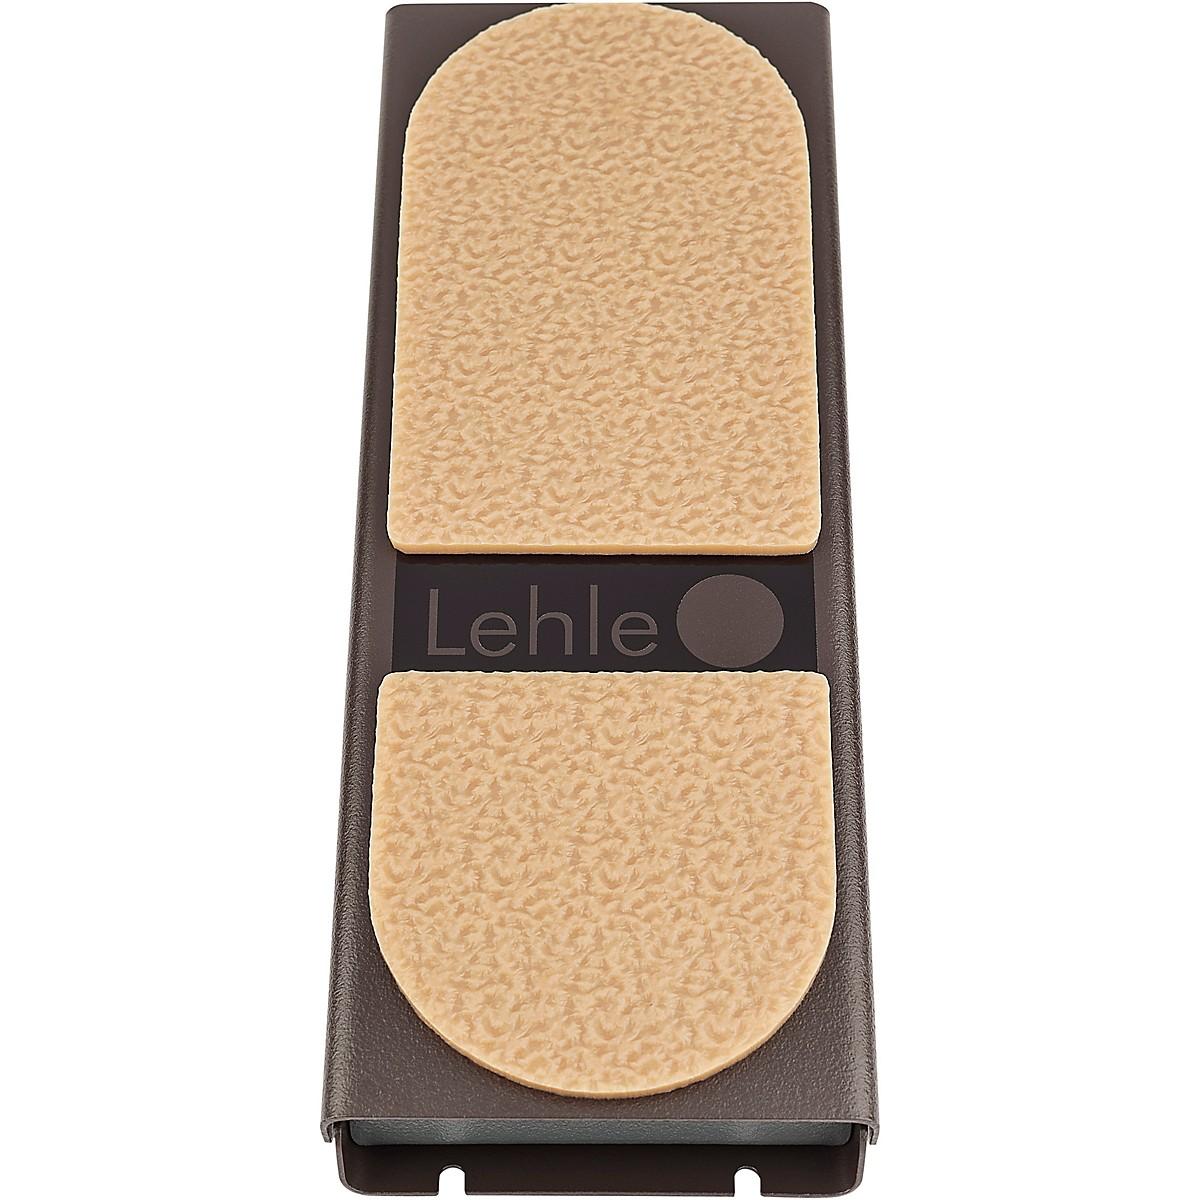 Lehle Stereo Volume Pedal